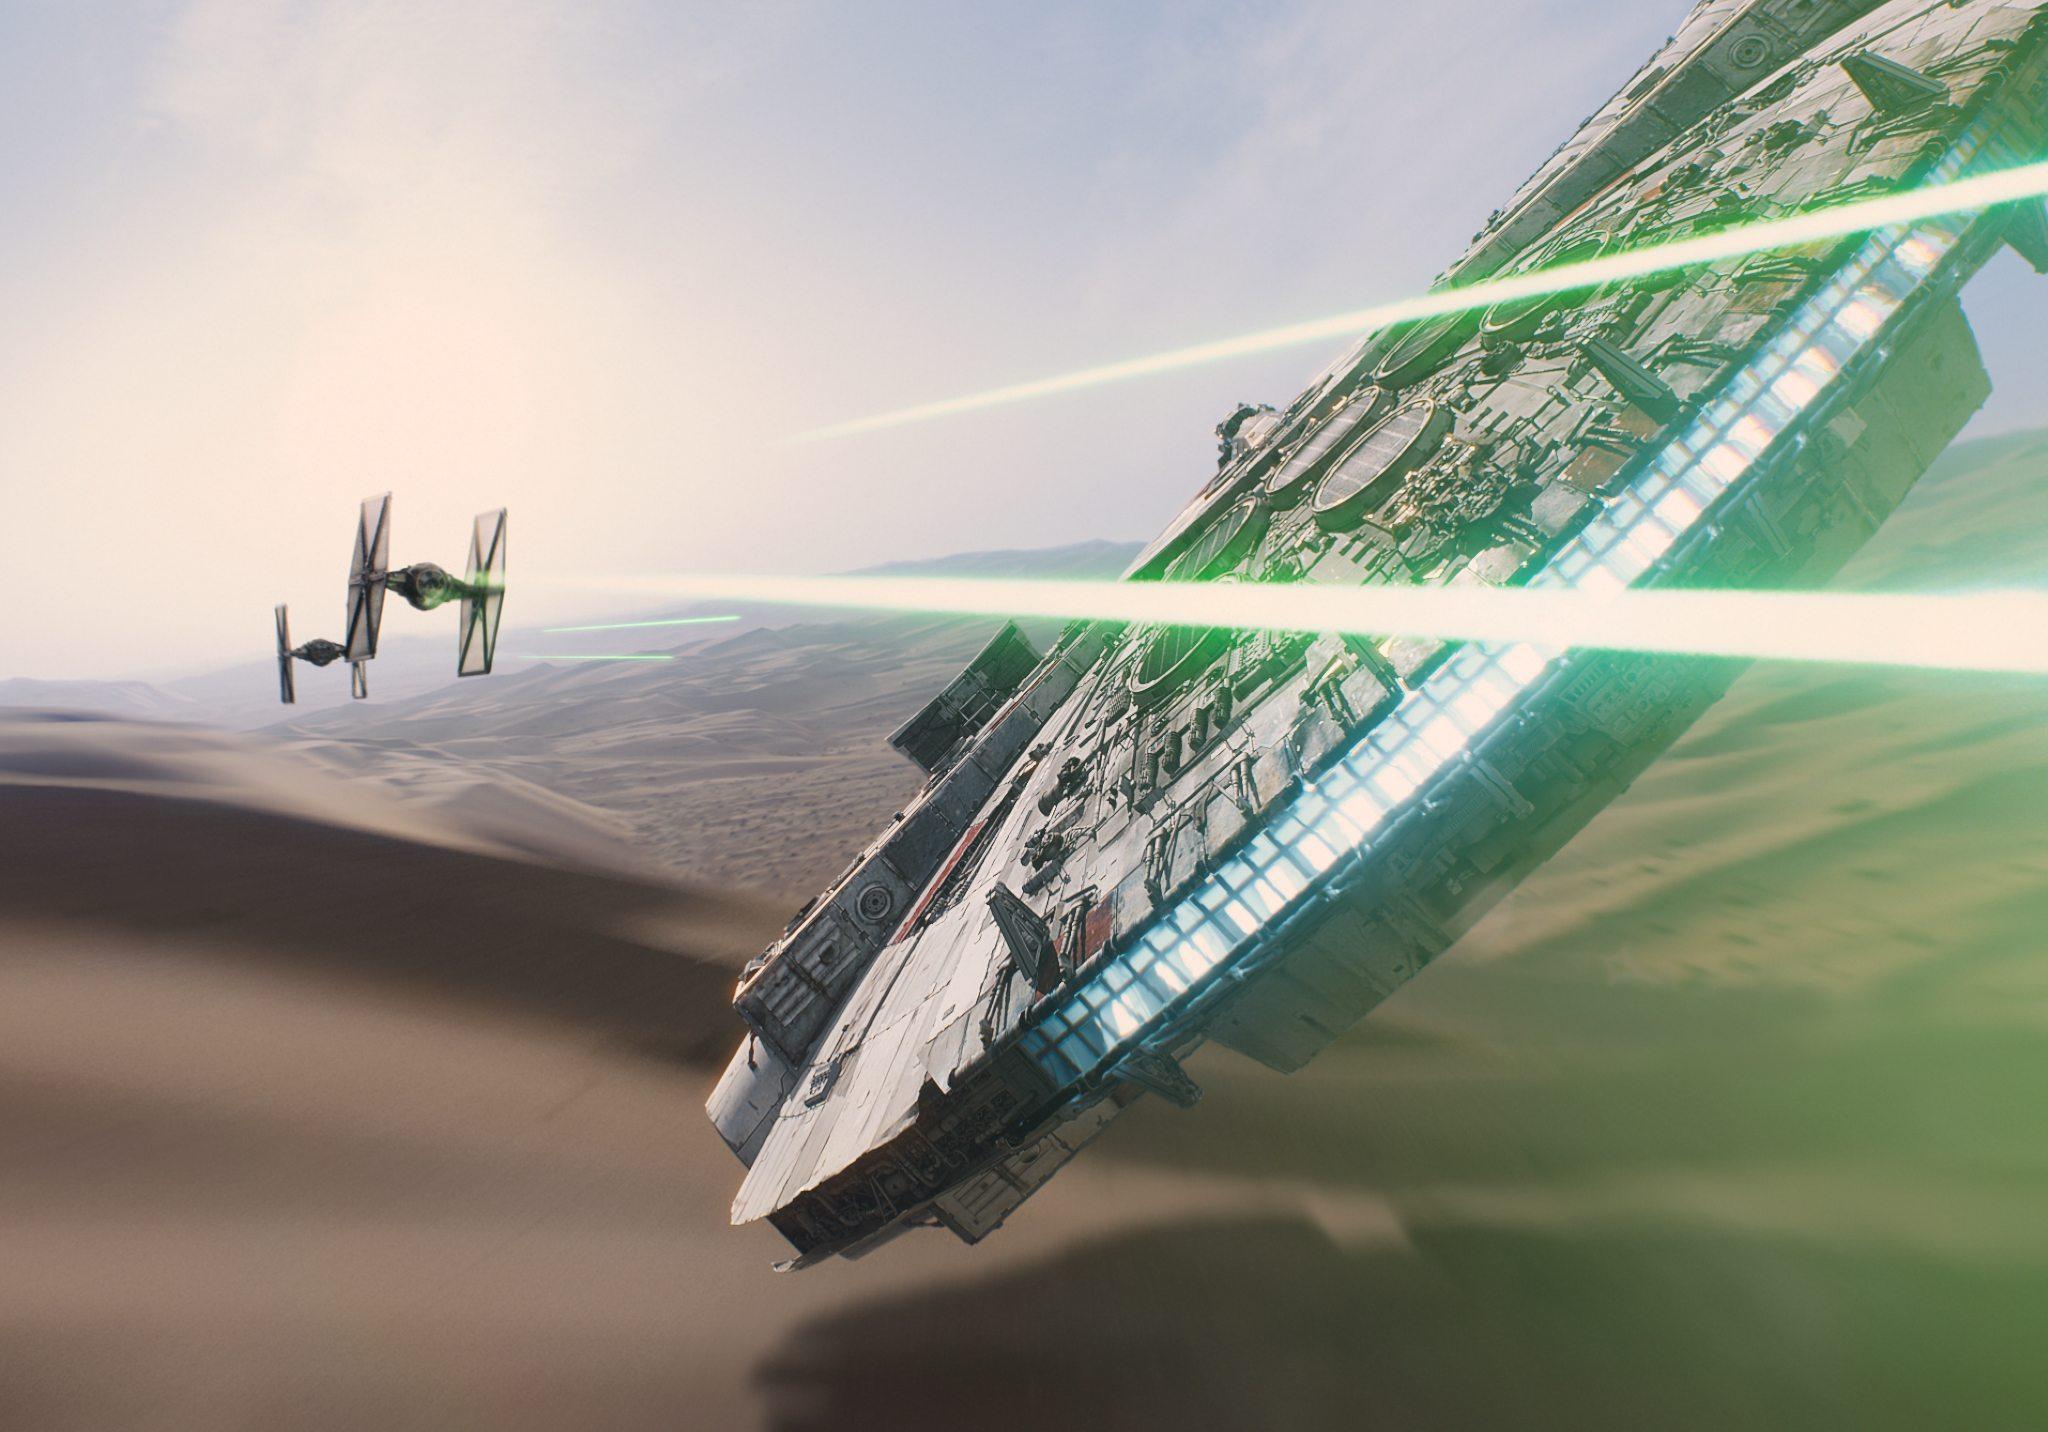 The Force Awakens Falcon BagoGames